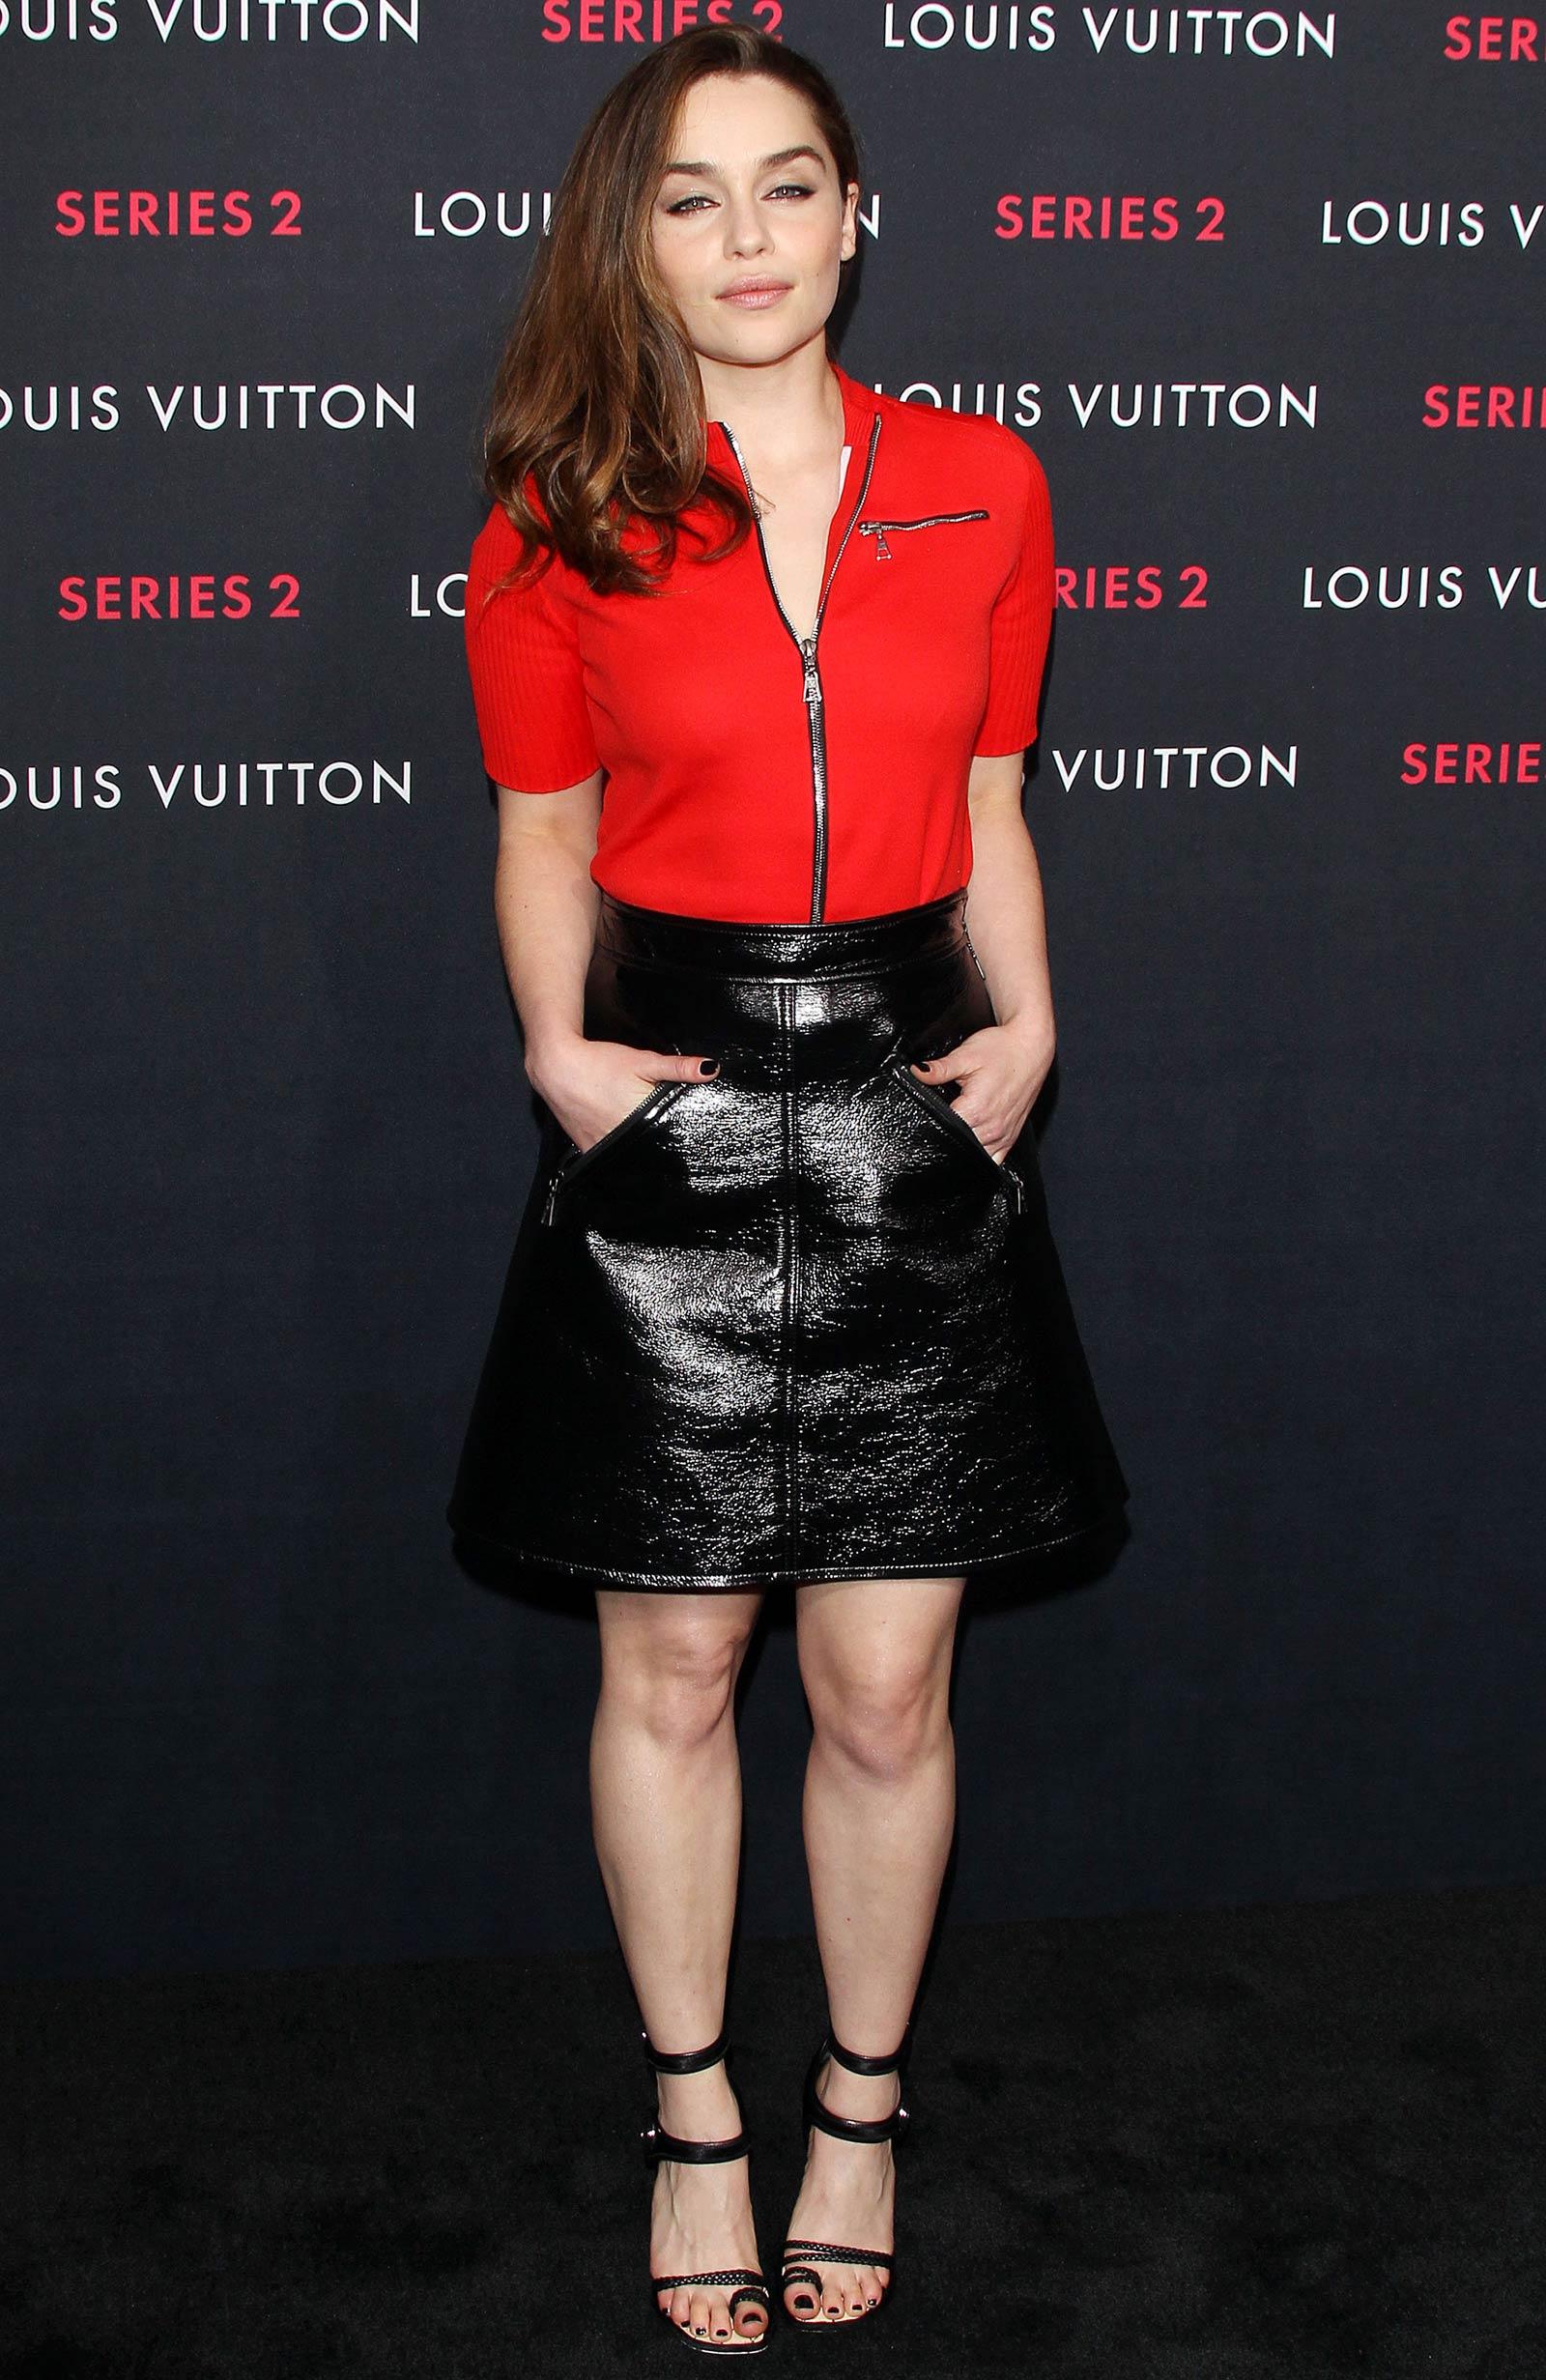 Emilia Clarke Attends Louis Vuitton Series 2 The